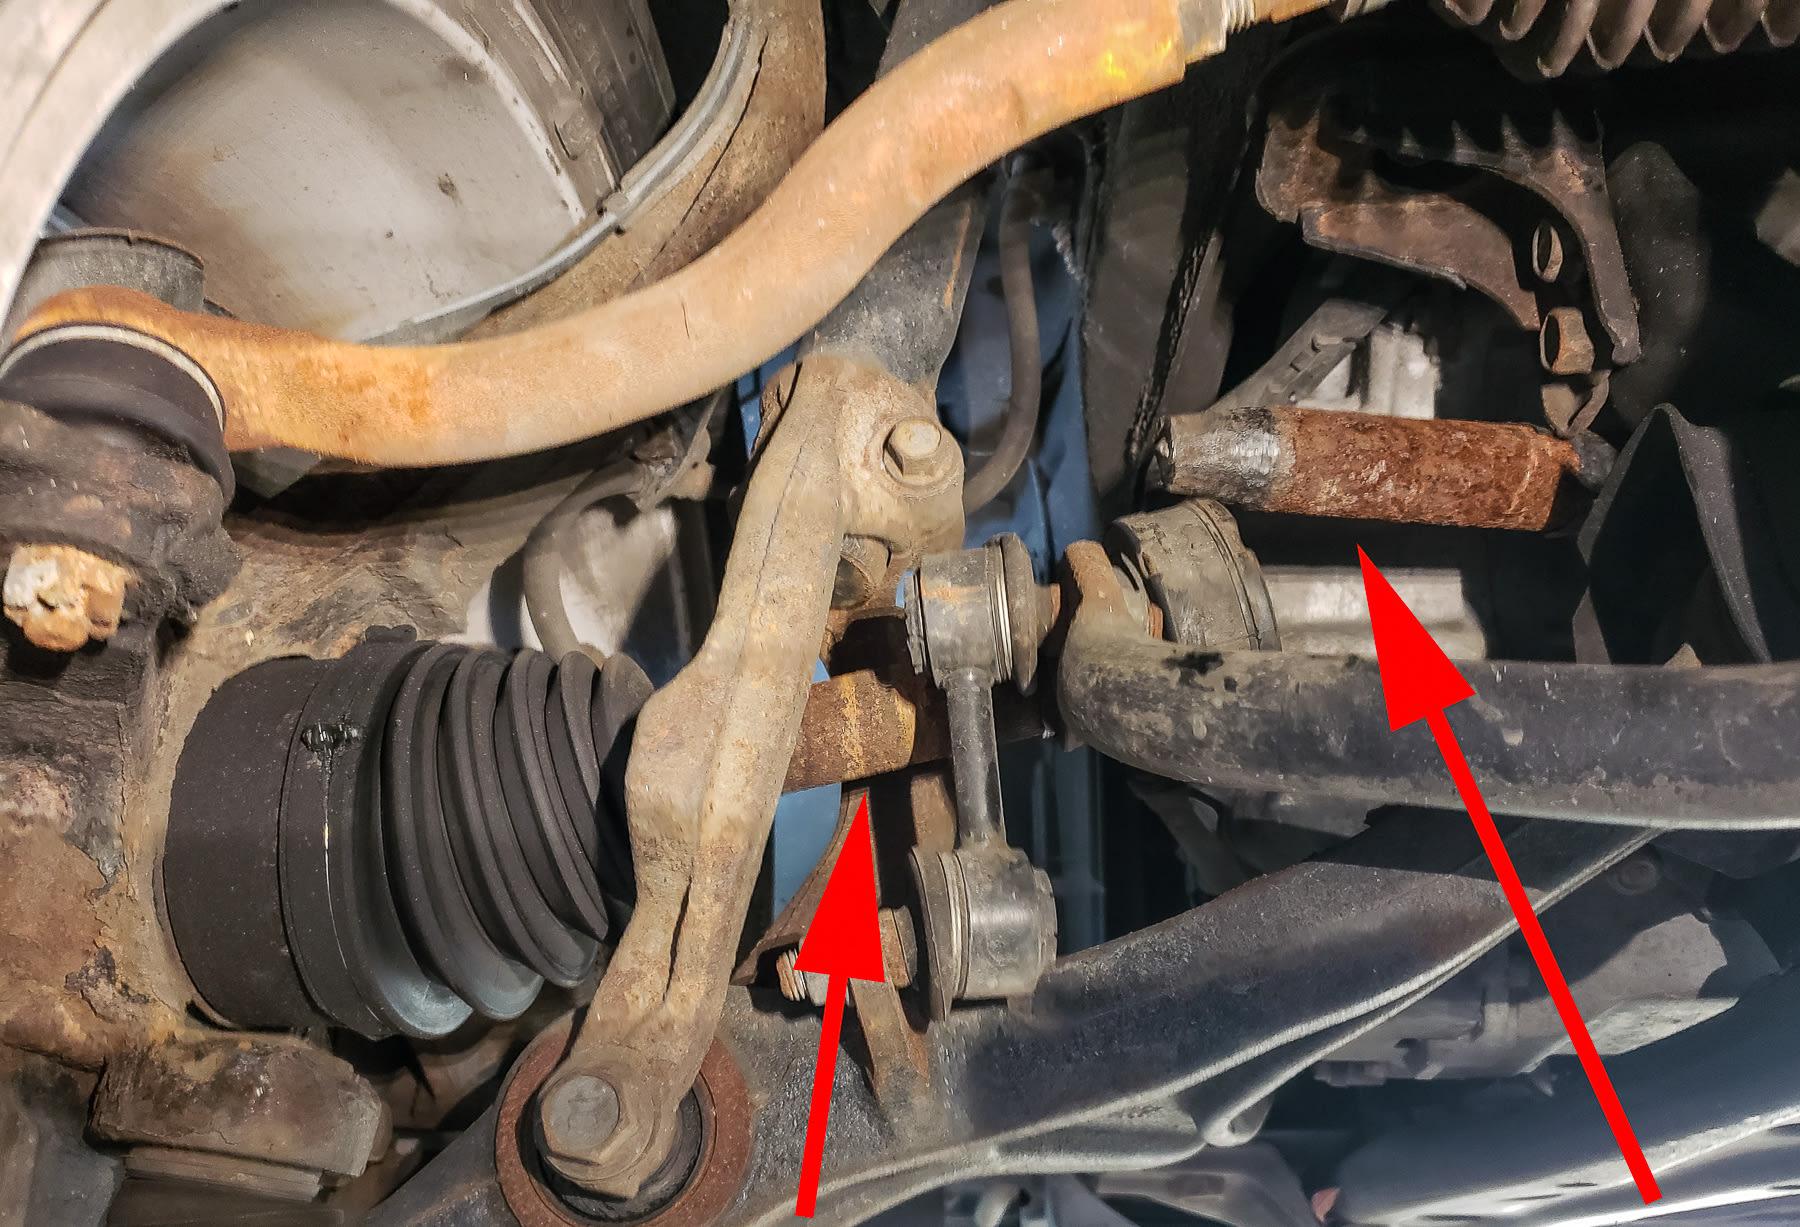 2004 Honda Accord - Axle Shaft Replacement